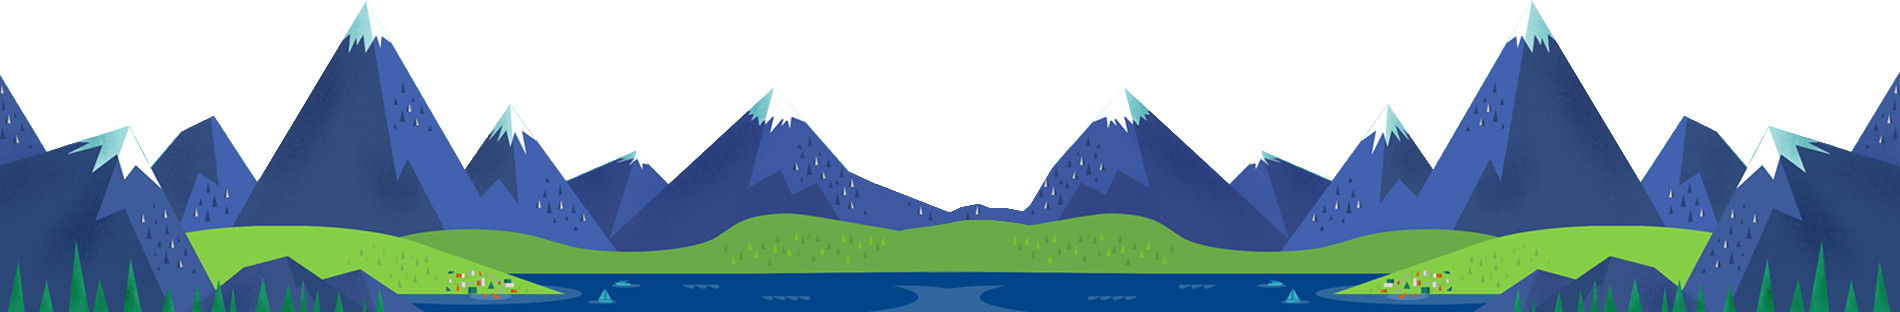 Google Mountains Image